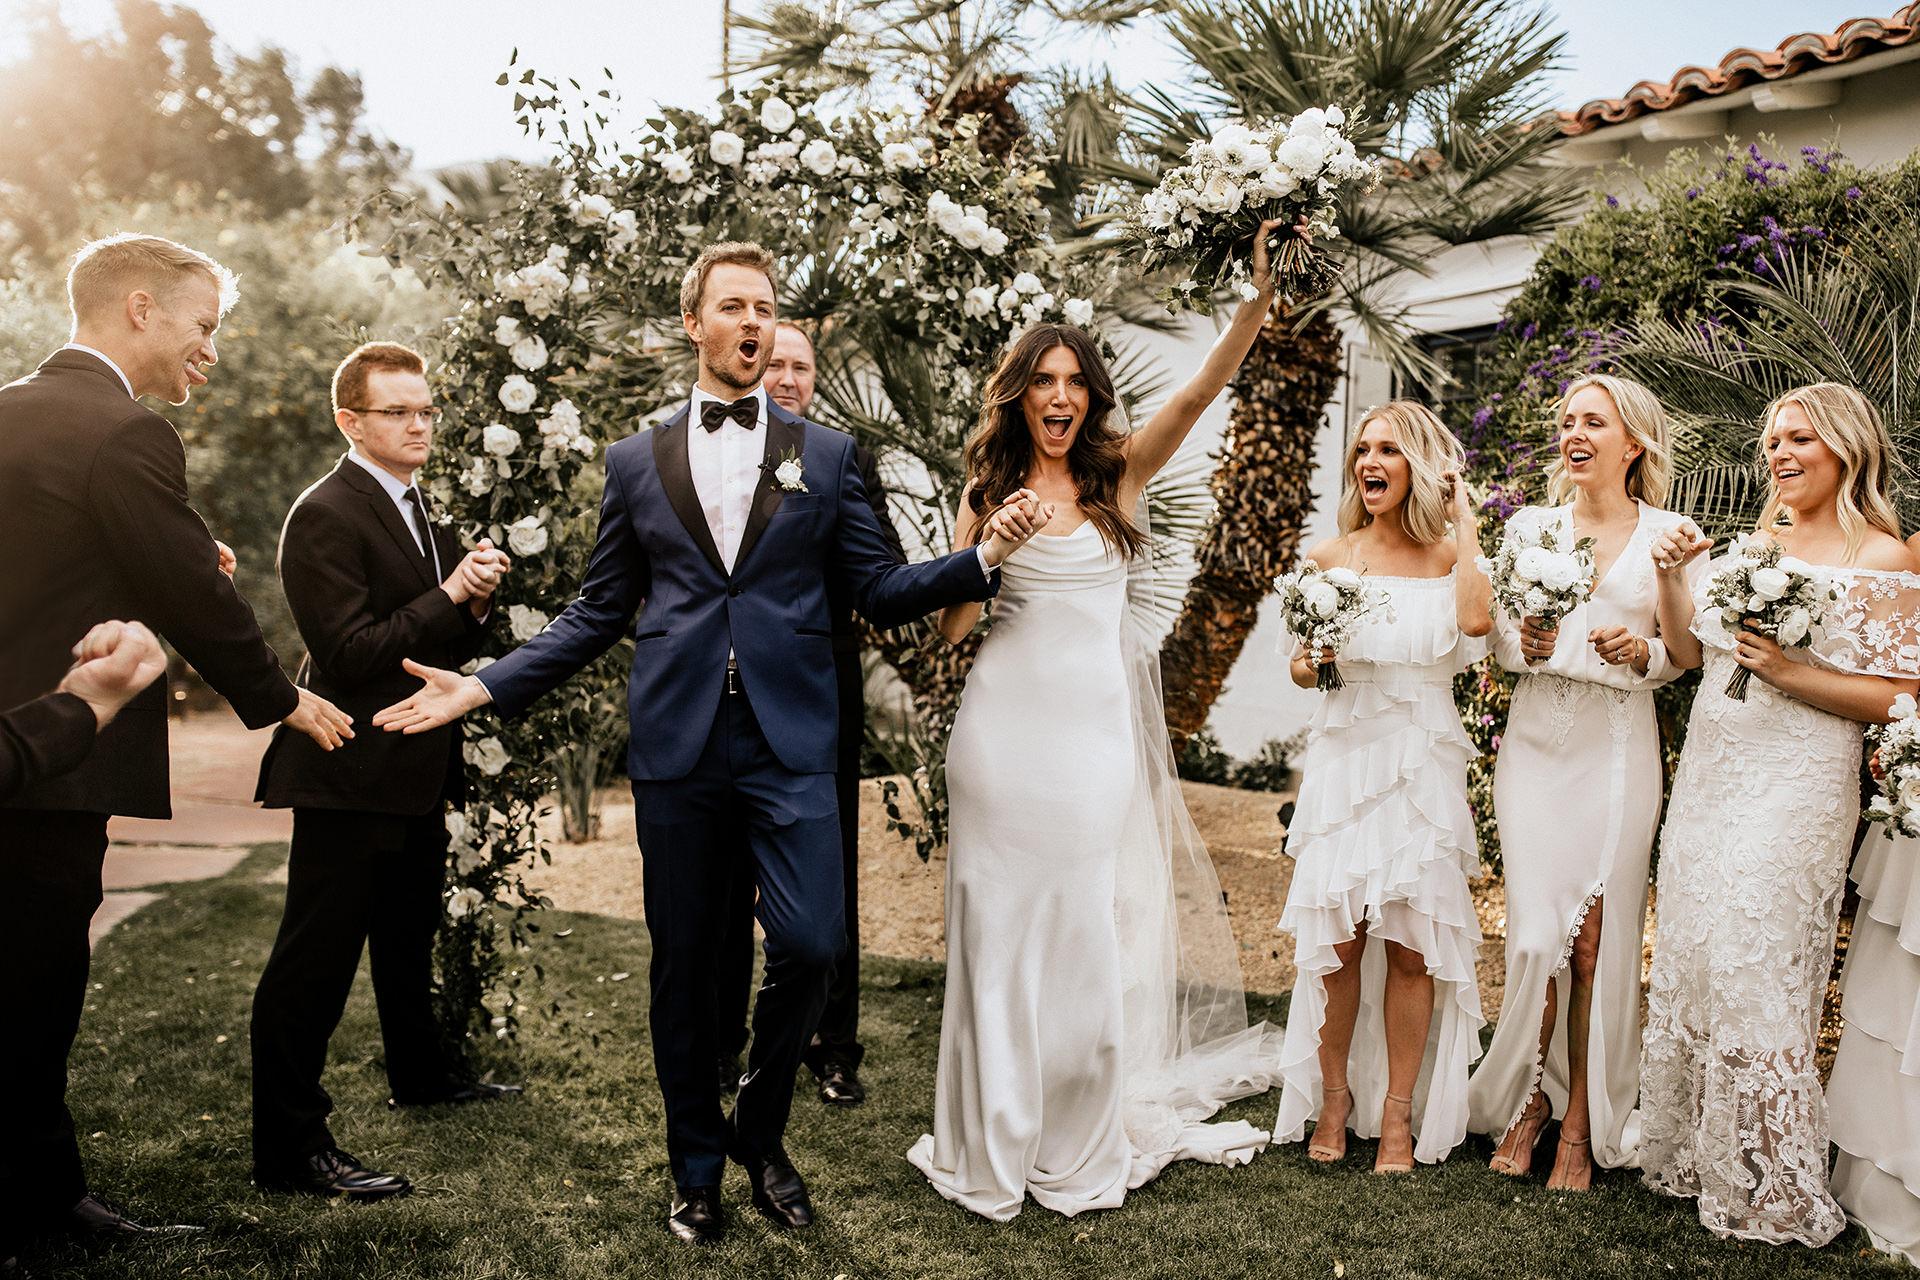 https://nataliabazilenco.com/foto/mira/uploads/2019/08/Palm-Springs-Wedding-Photographer-CA-001.jpg